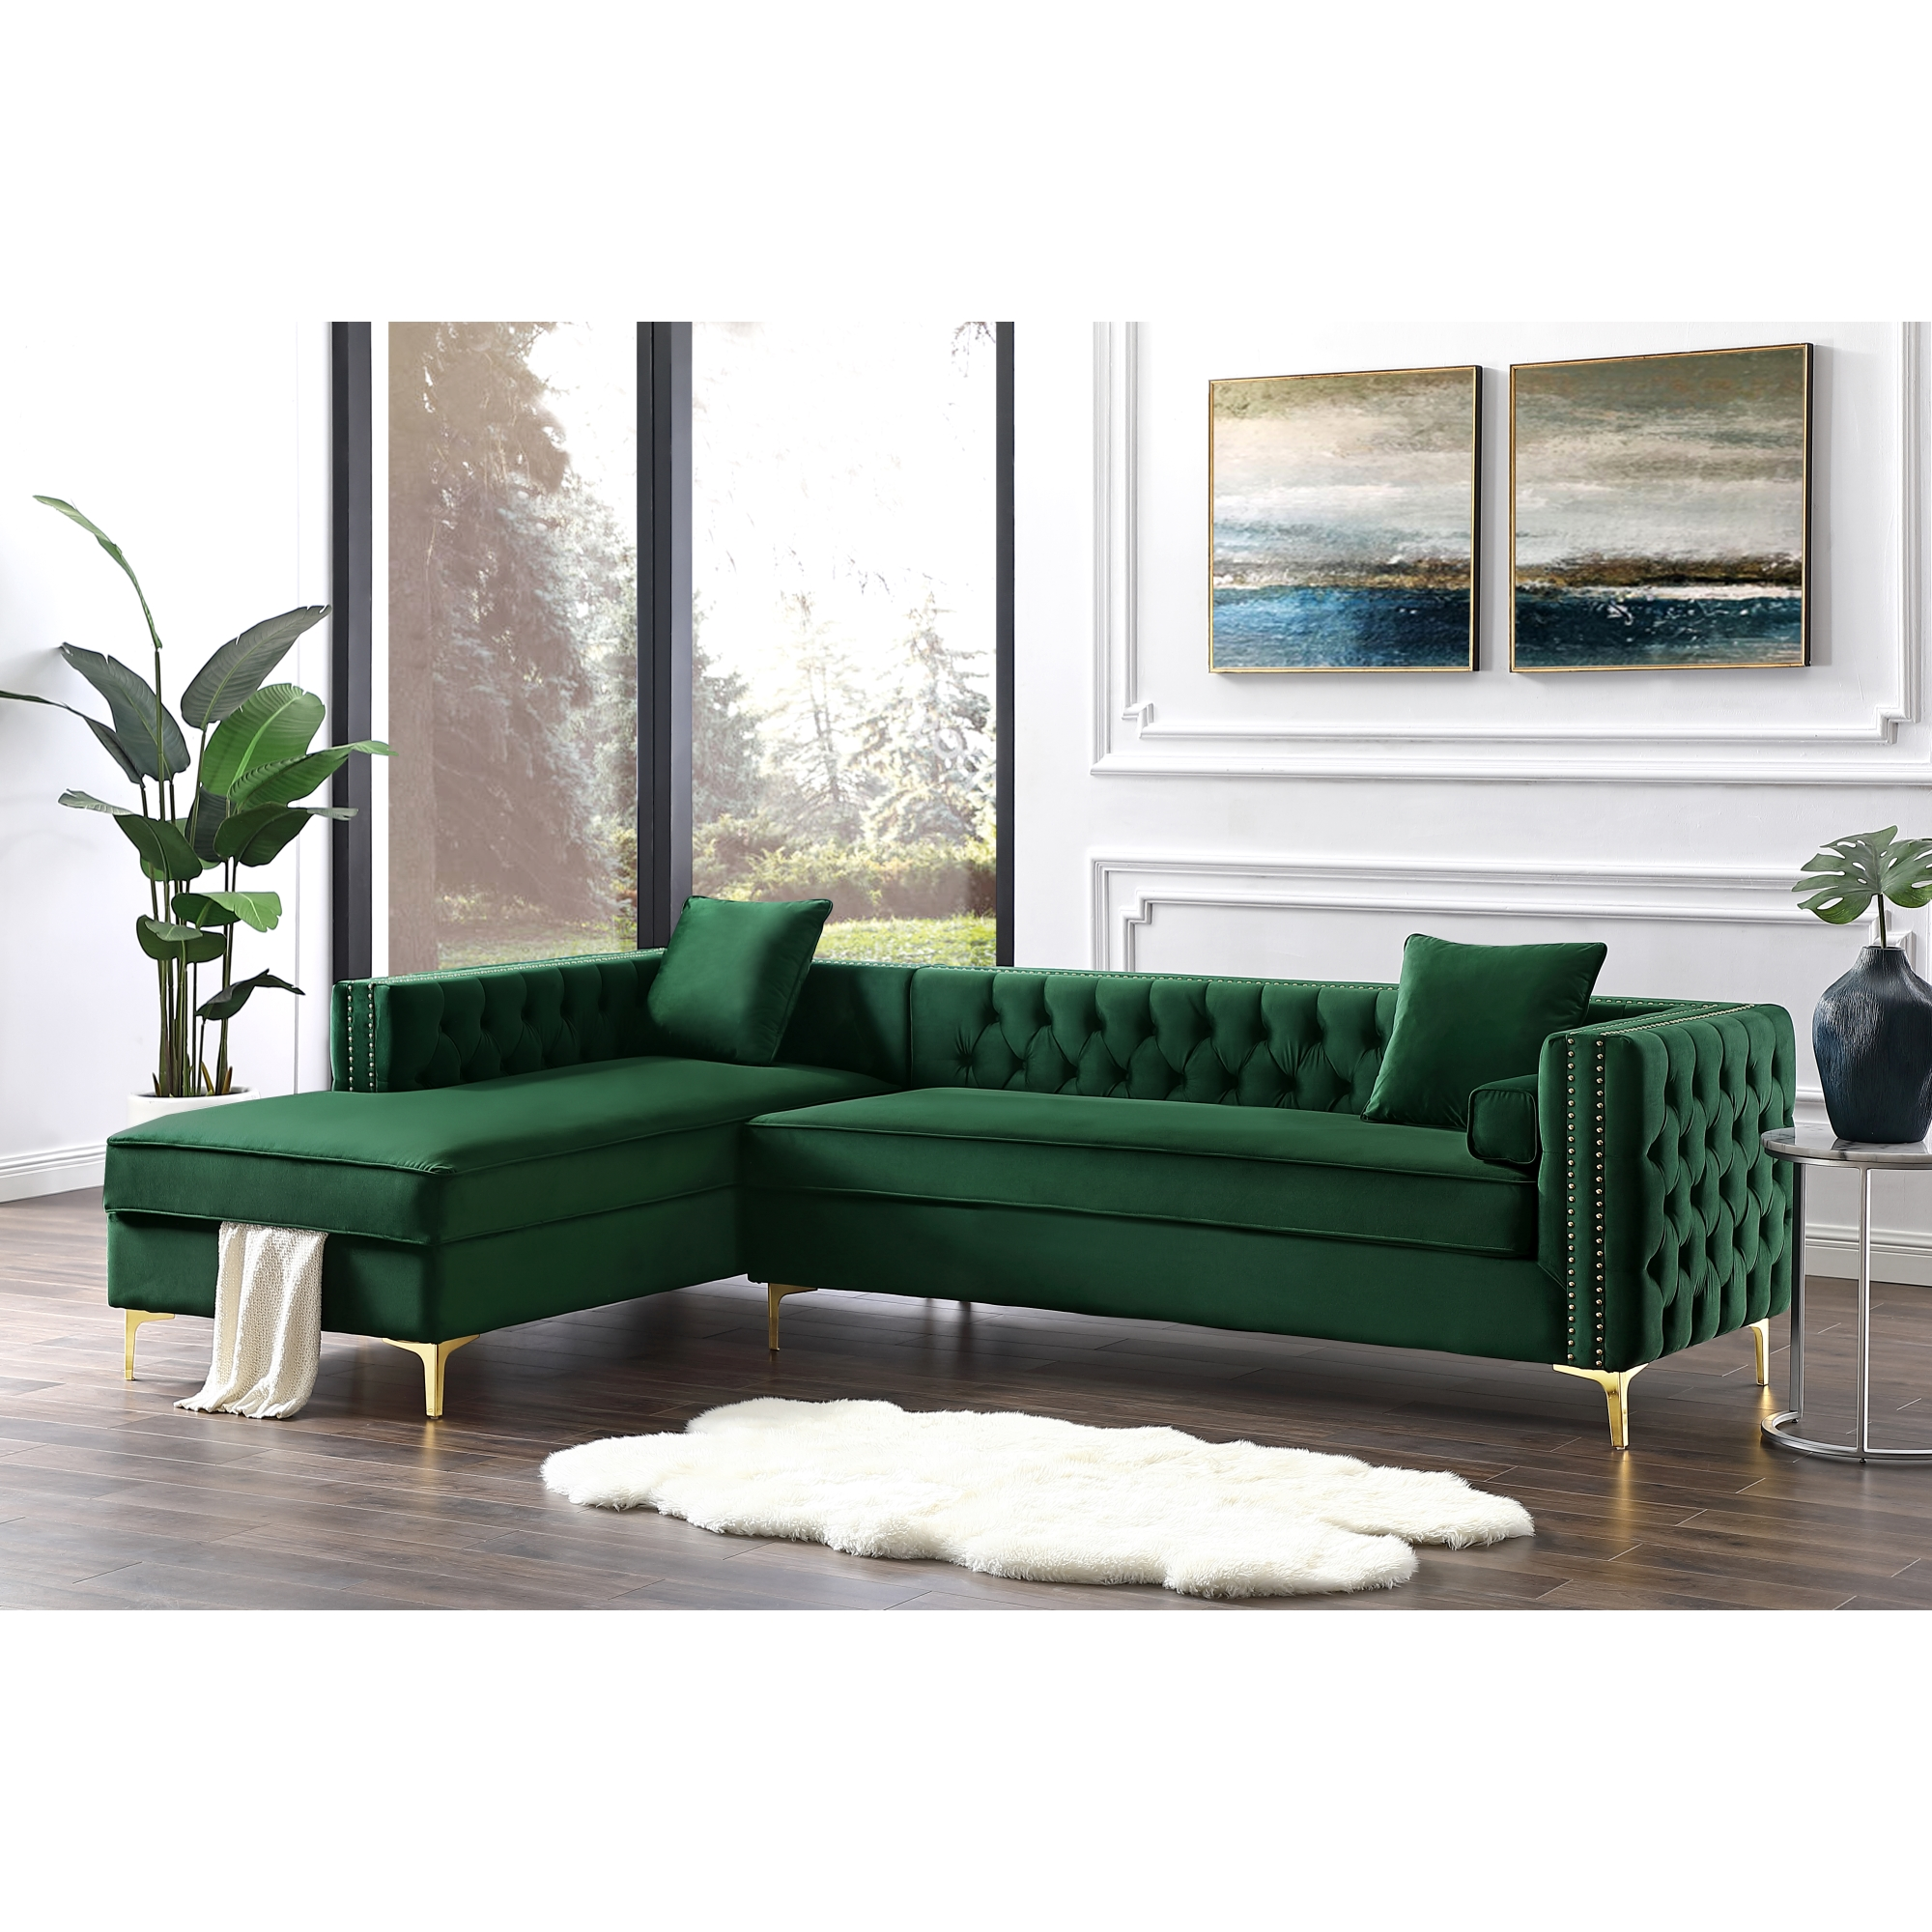 "Craig Hunter Green Velvet Chaise Sectional Sofa - 115"" | Left Facing | Tufted | Nailhead Trim"